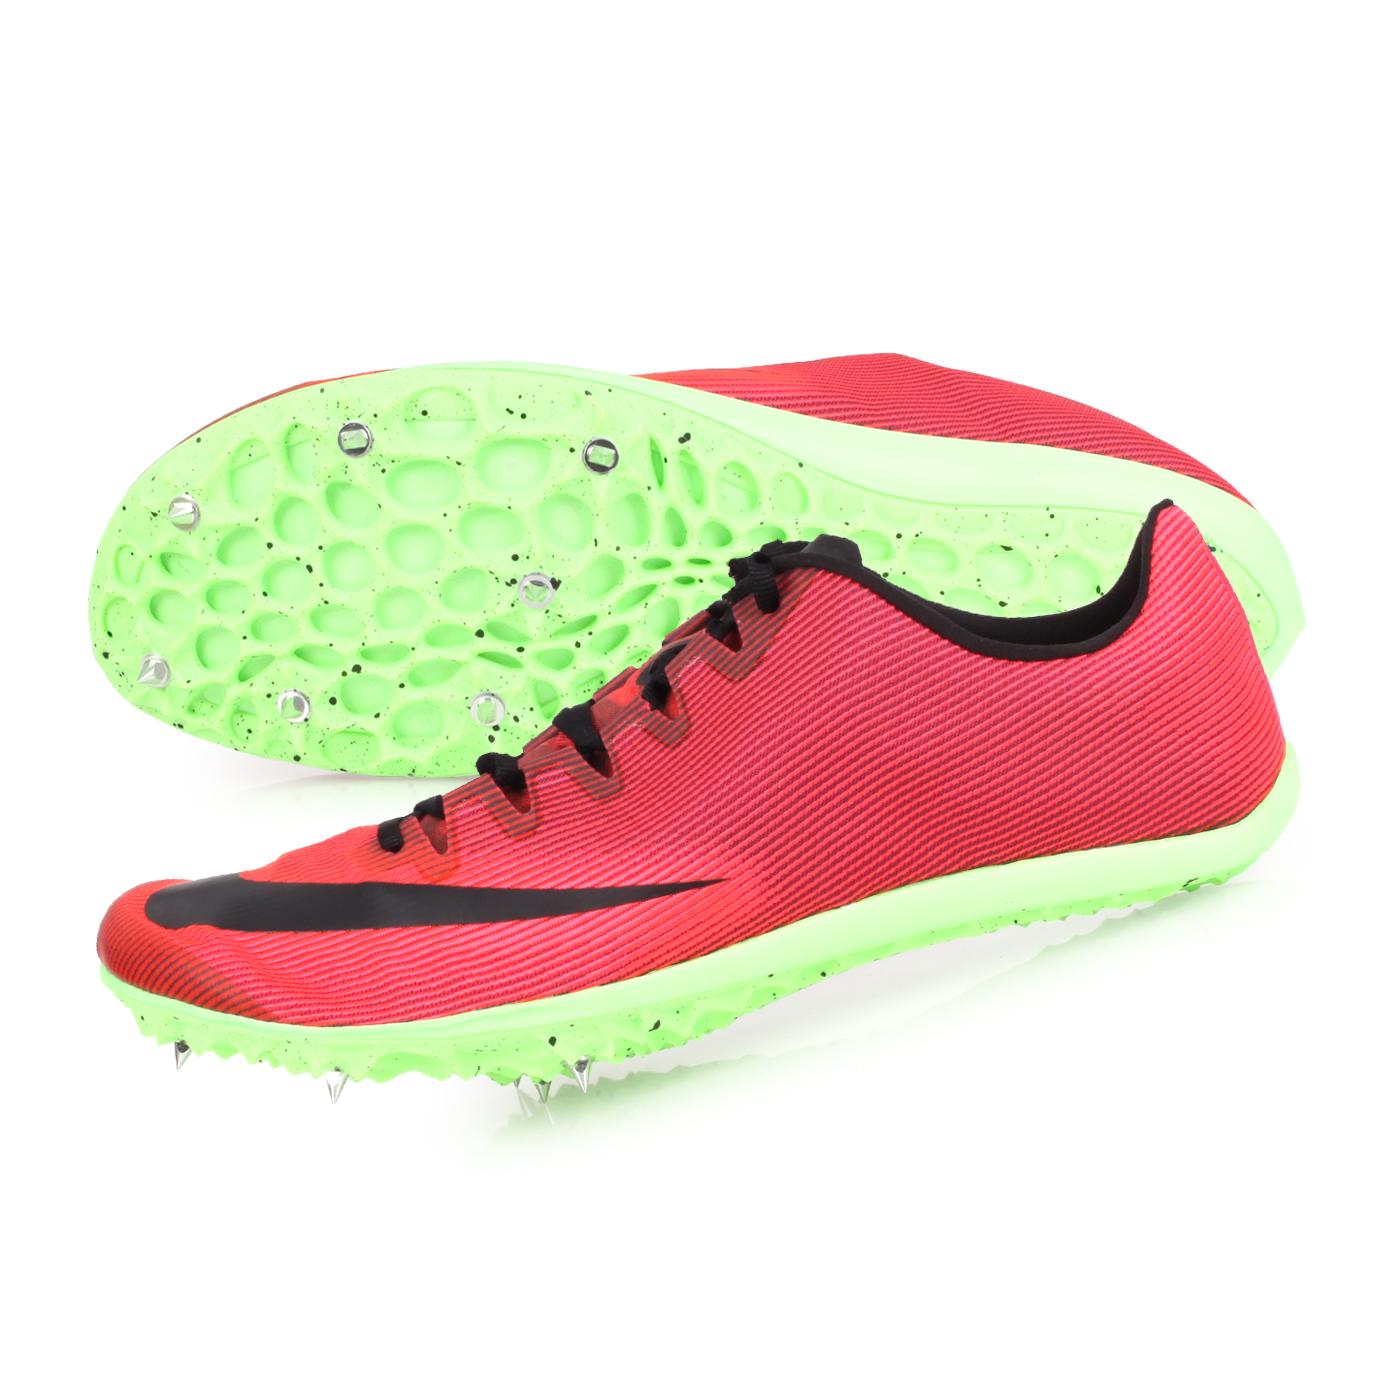 NIKE 田徑釘鞋(短距離)  @ZOOM 400@AA1205003 - 紅黑綠